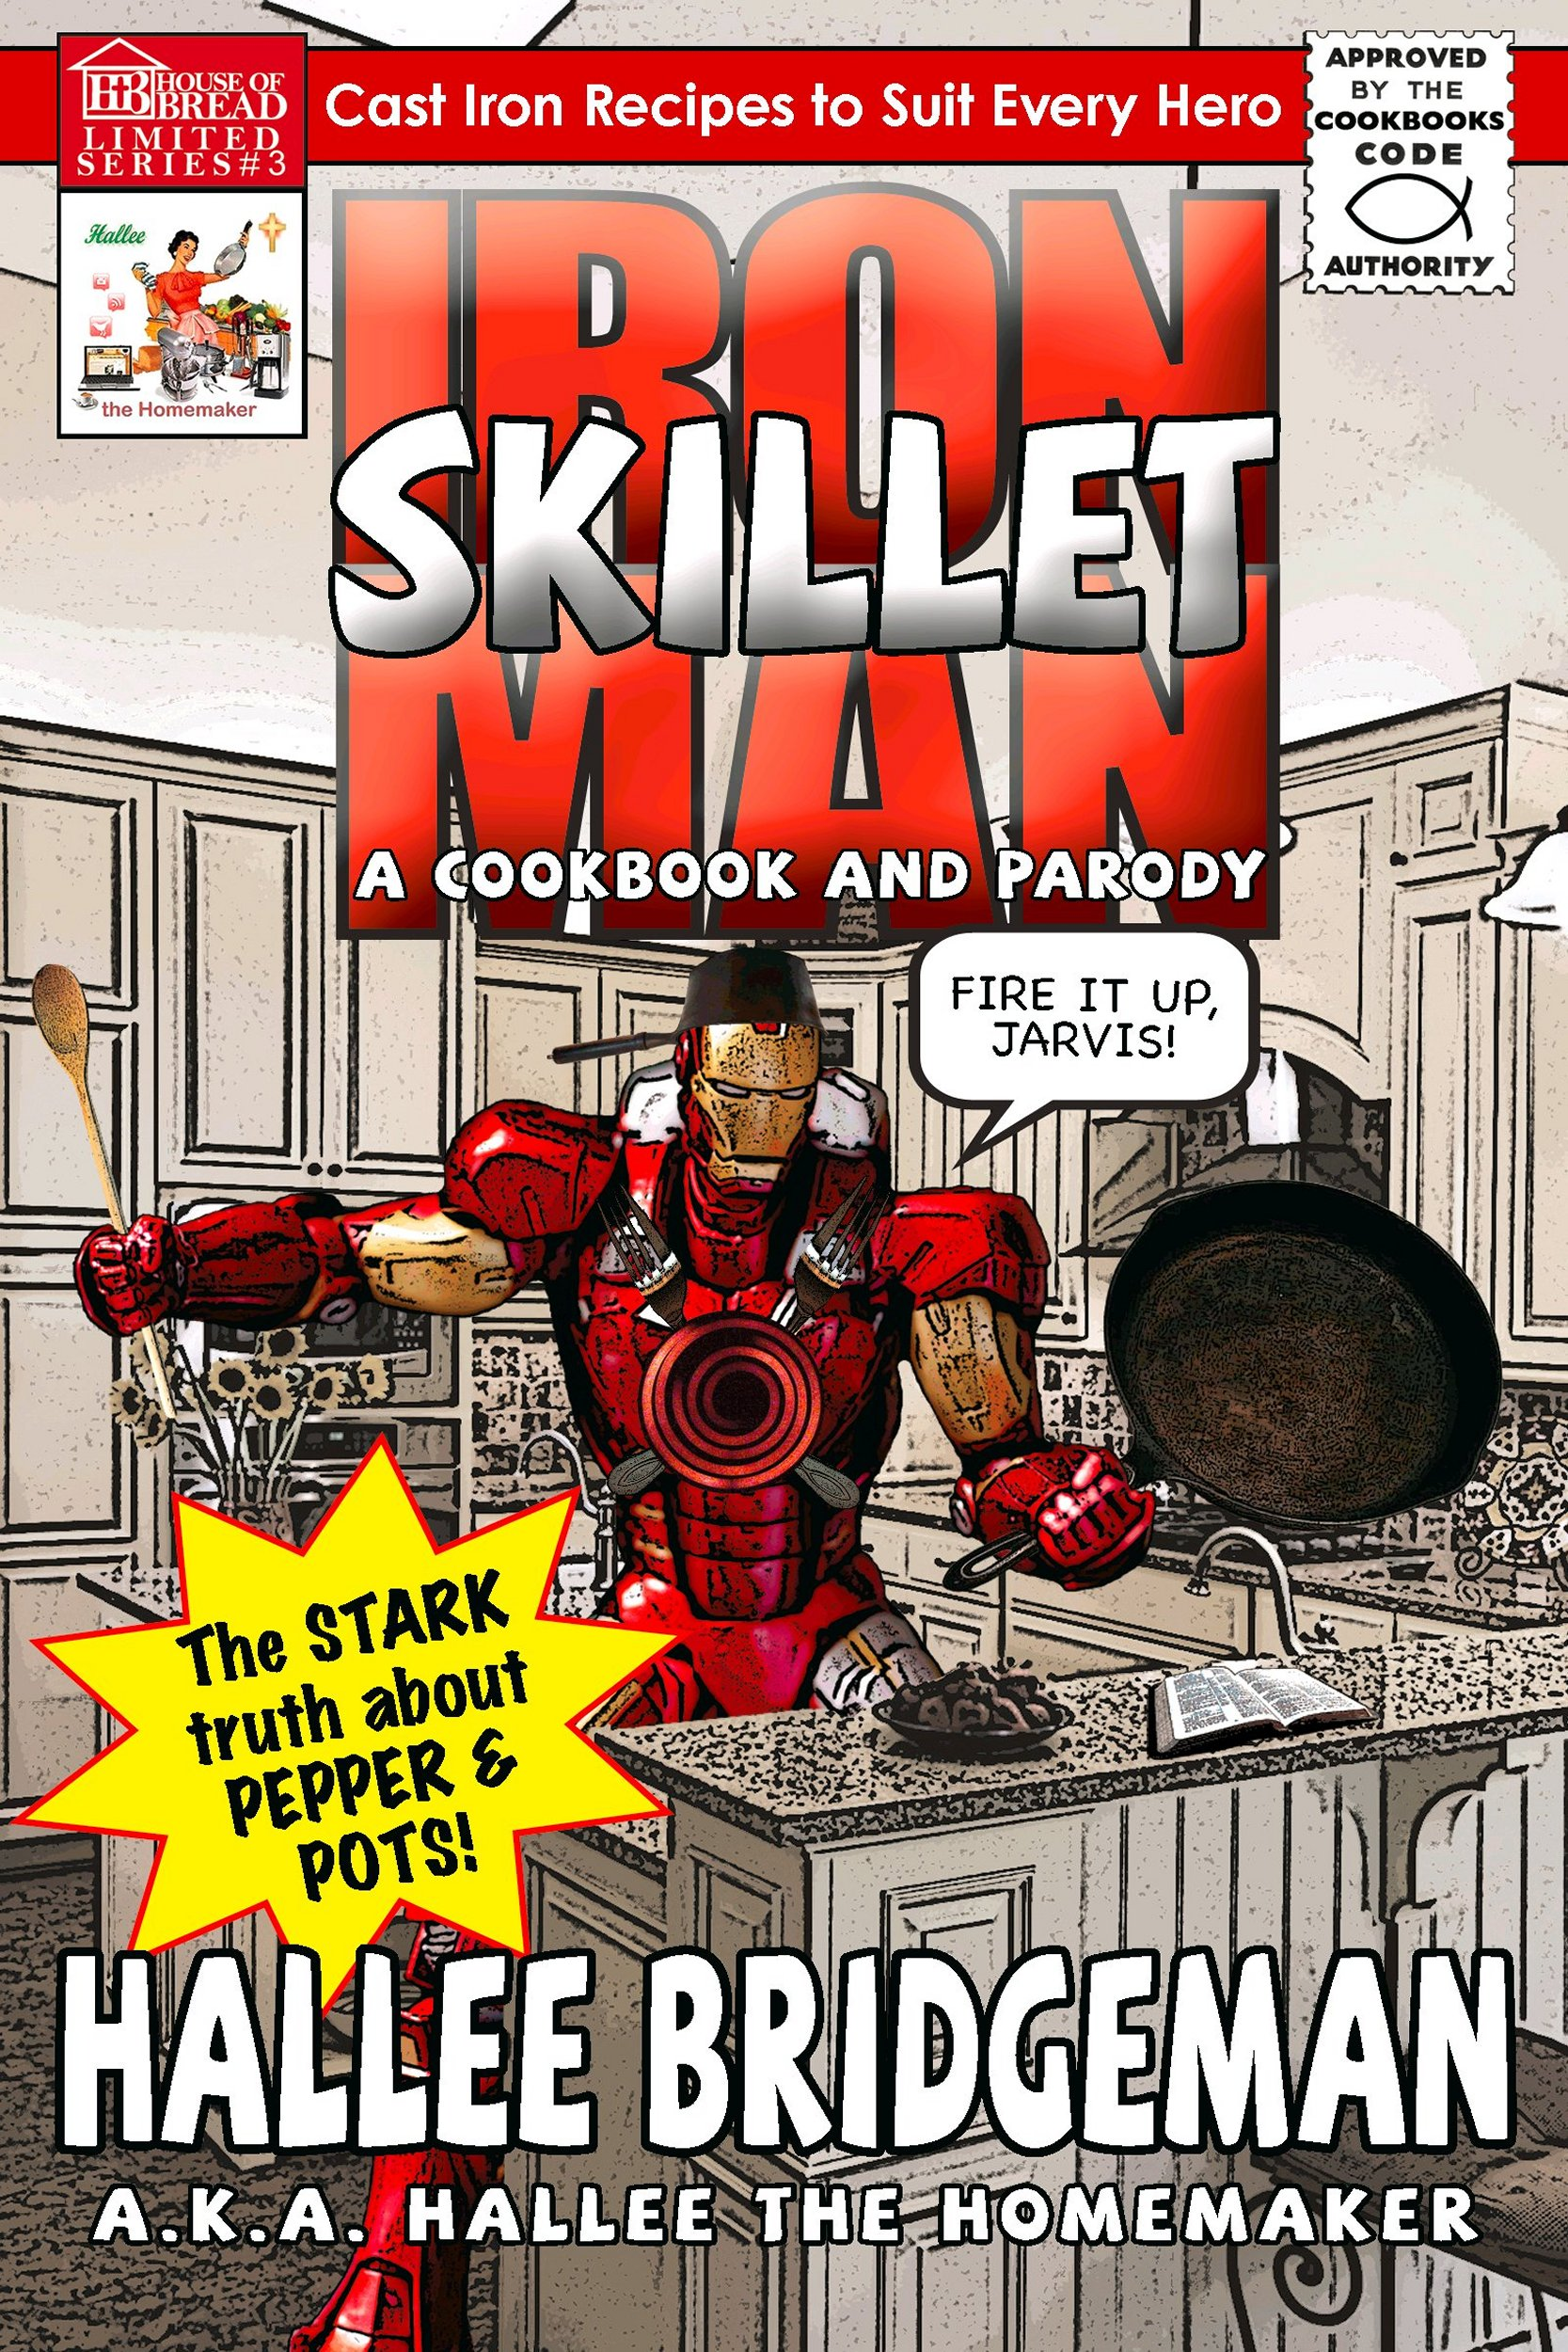 Iron Skillet Man